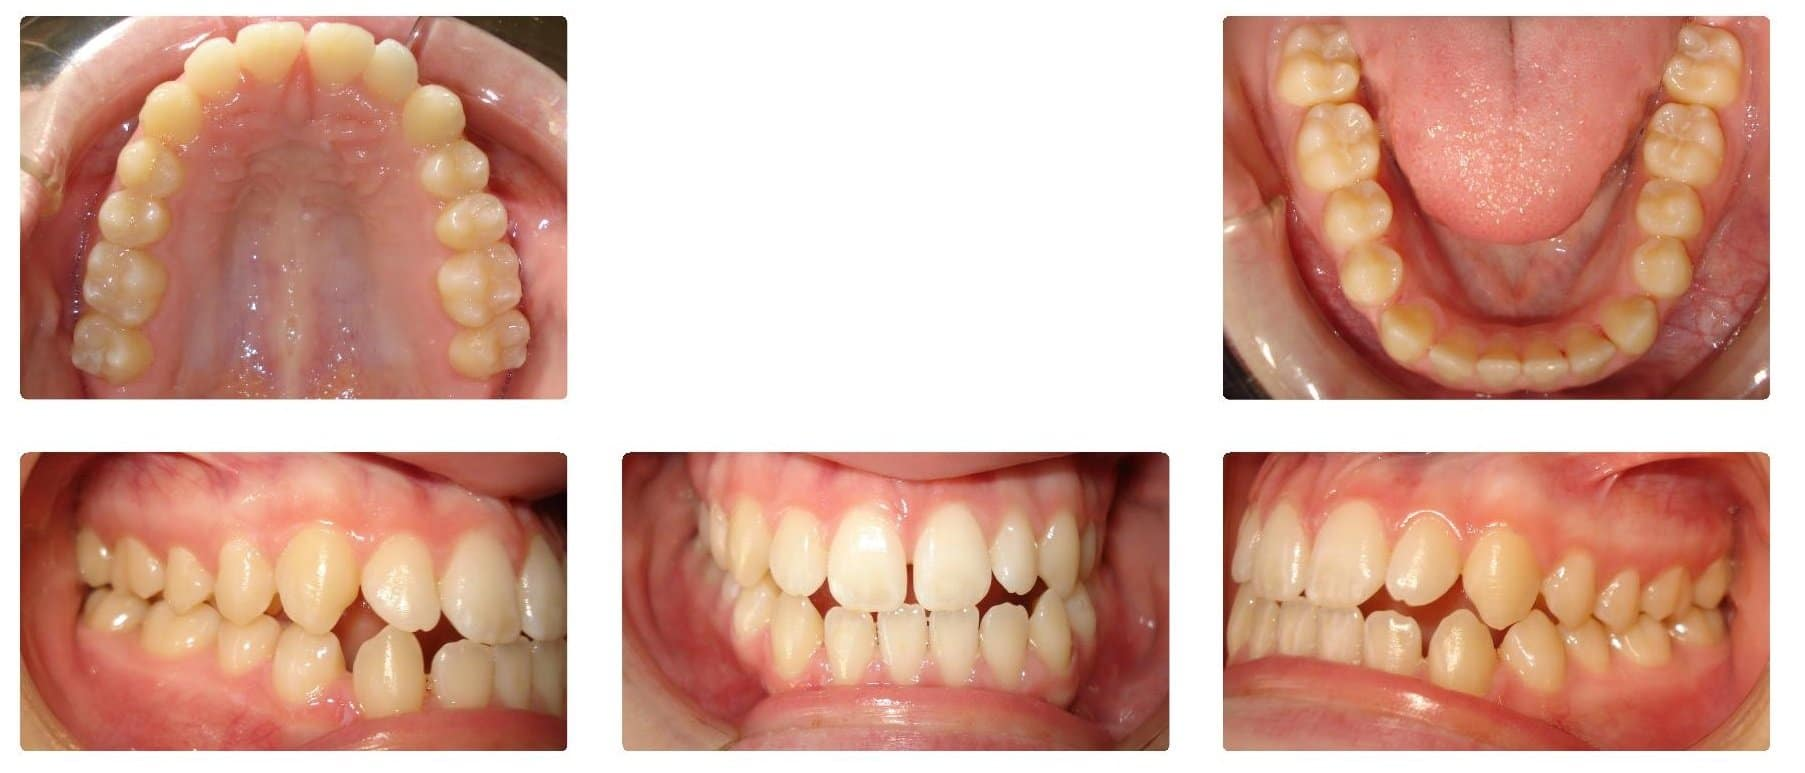 NJ Orthodontist - Invisalign & Braces | West Windsor